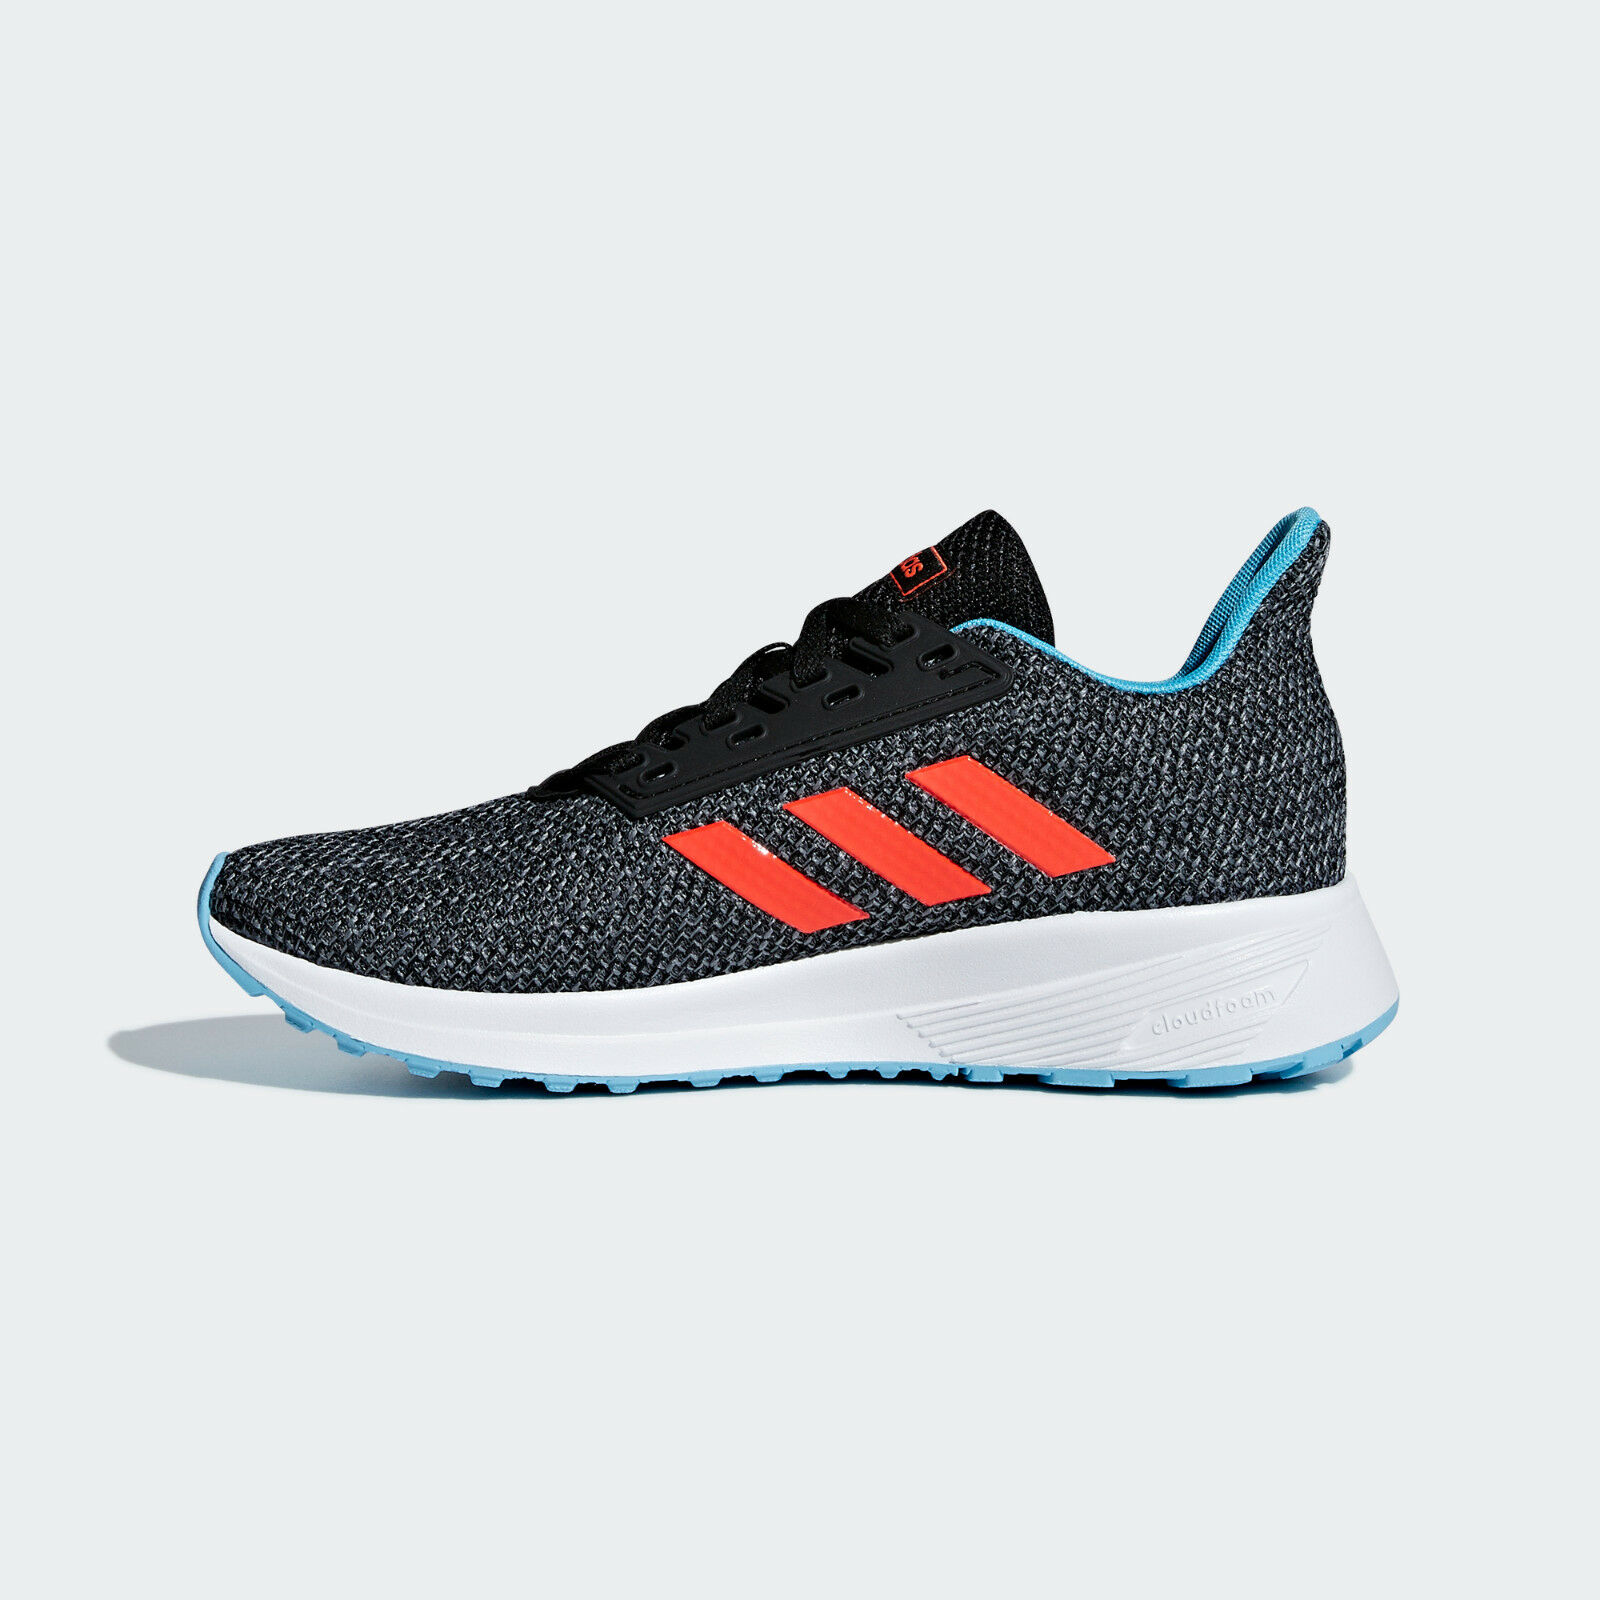 Adidas Duramo 9 K Laufen schuhe Kids schuhe Turnschuhe Sport schuhe bb7064 Größe 28-34